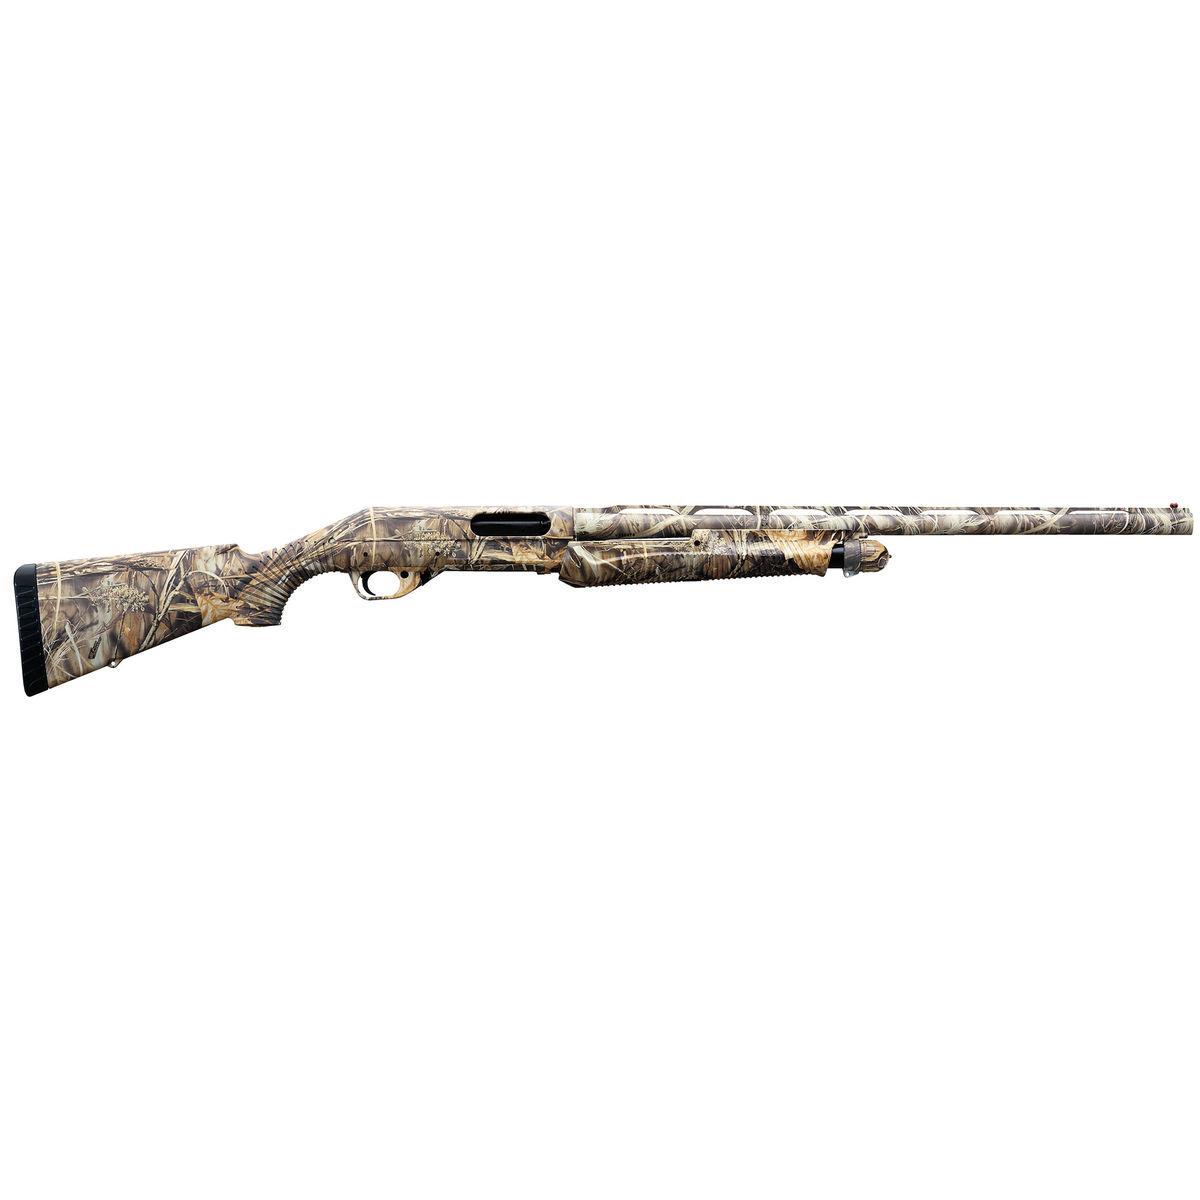 Gun For Hunting-Benelli Nova Realtree MAX-4 Pump Action ...